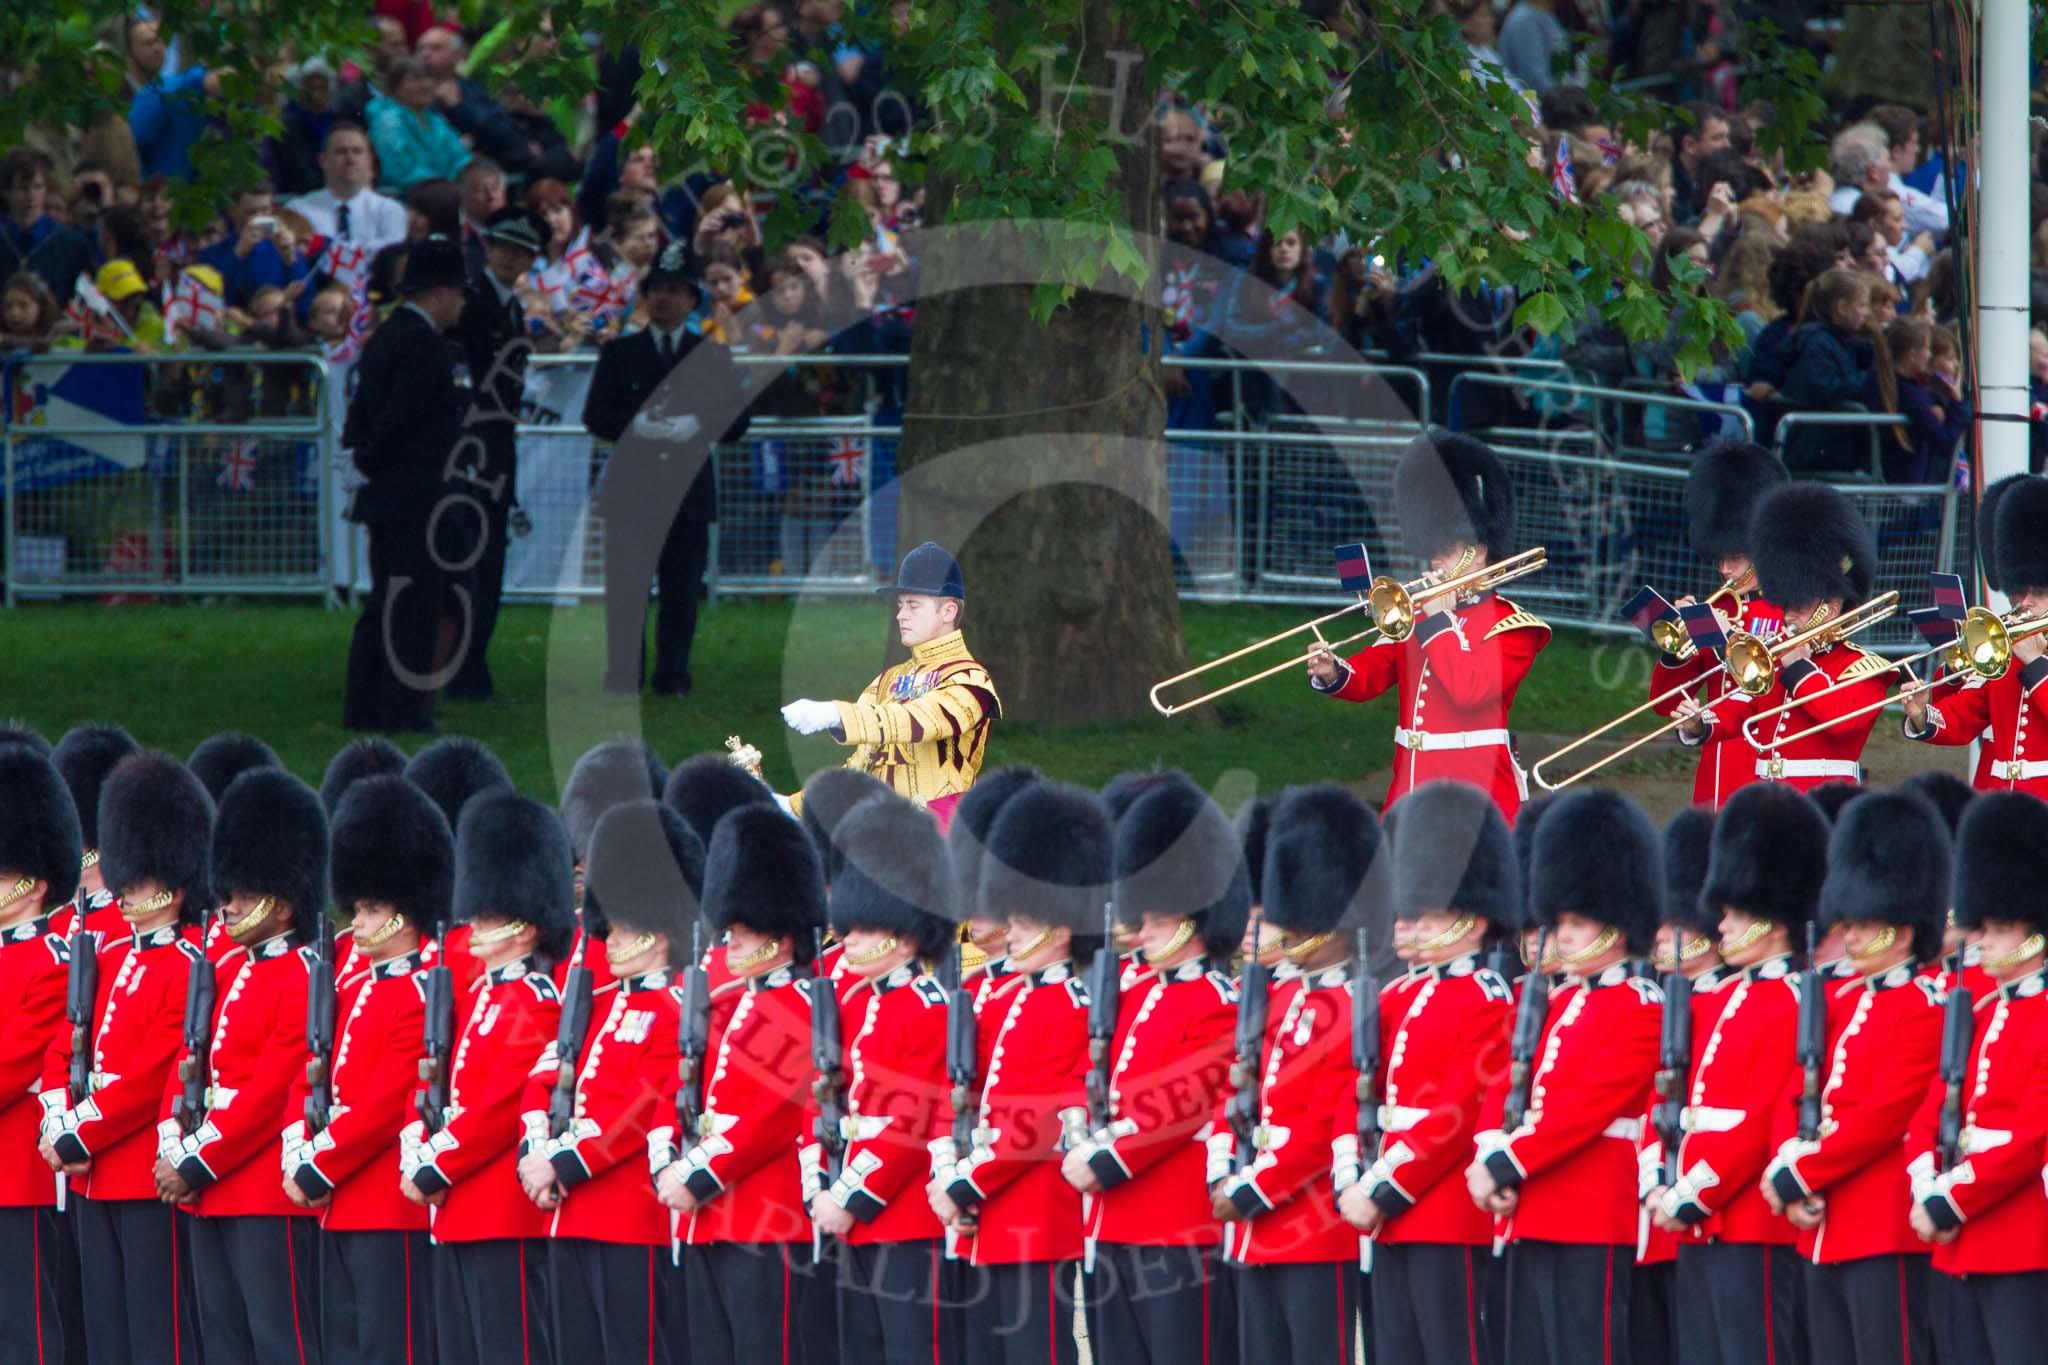 Queen's Birthday Parade 2013 - Trooping the Colour Photos ...